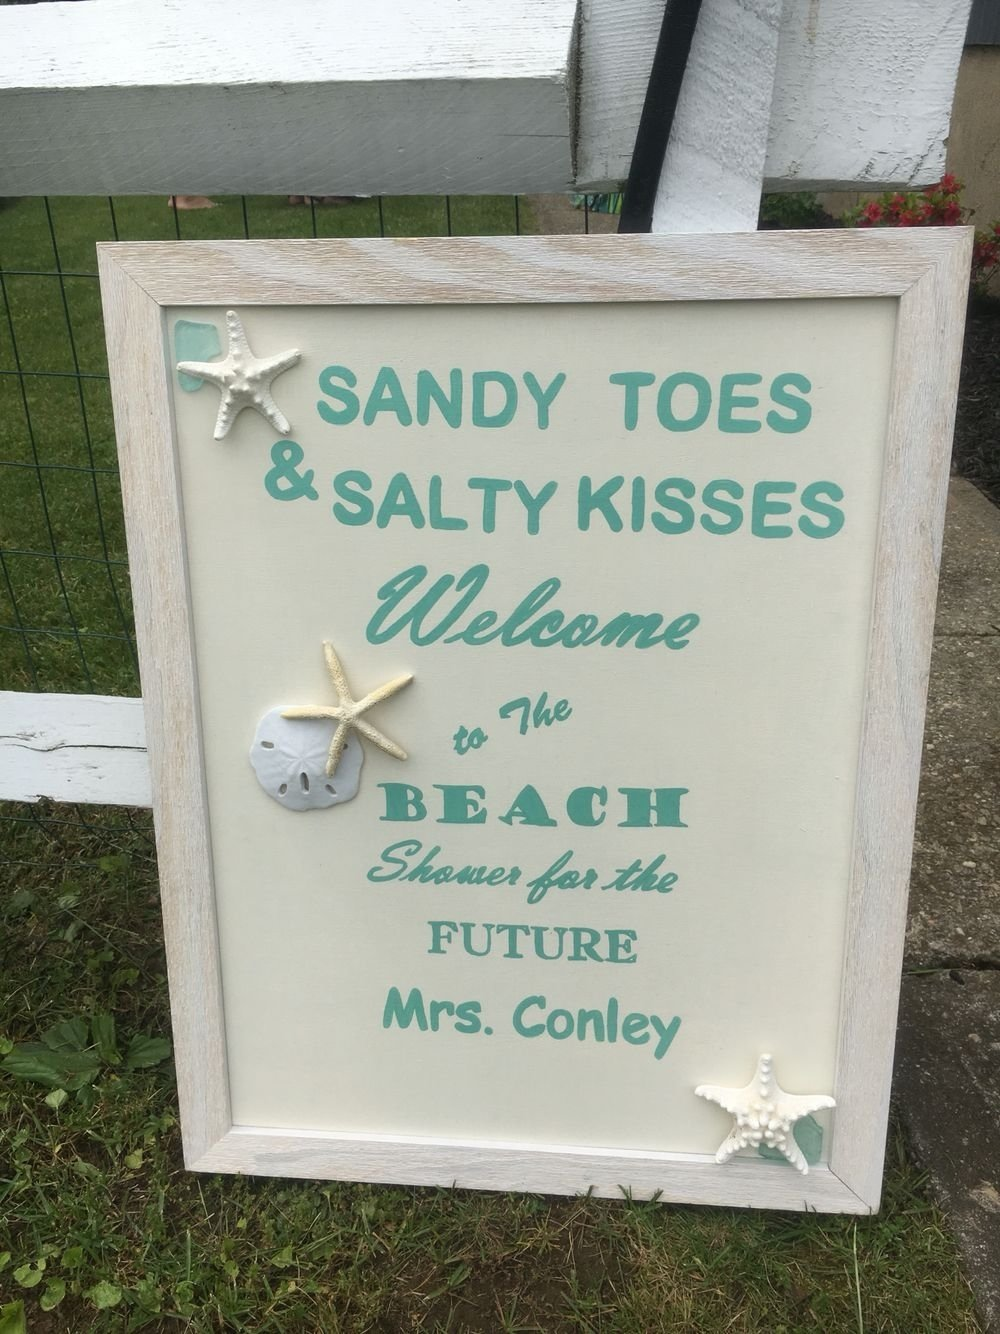 10 Most Popular Beach Themed Bridal Shower Ideas beach bridal shower welcome sign bridal shower welcome sign 2020